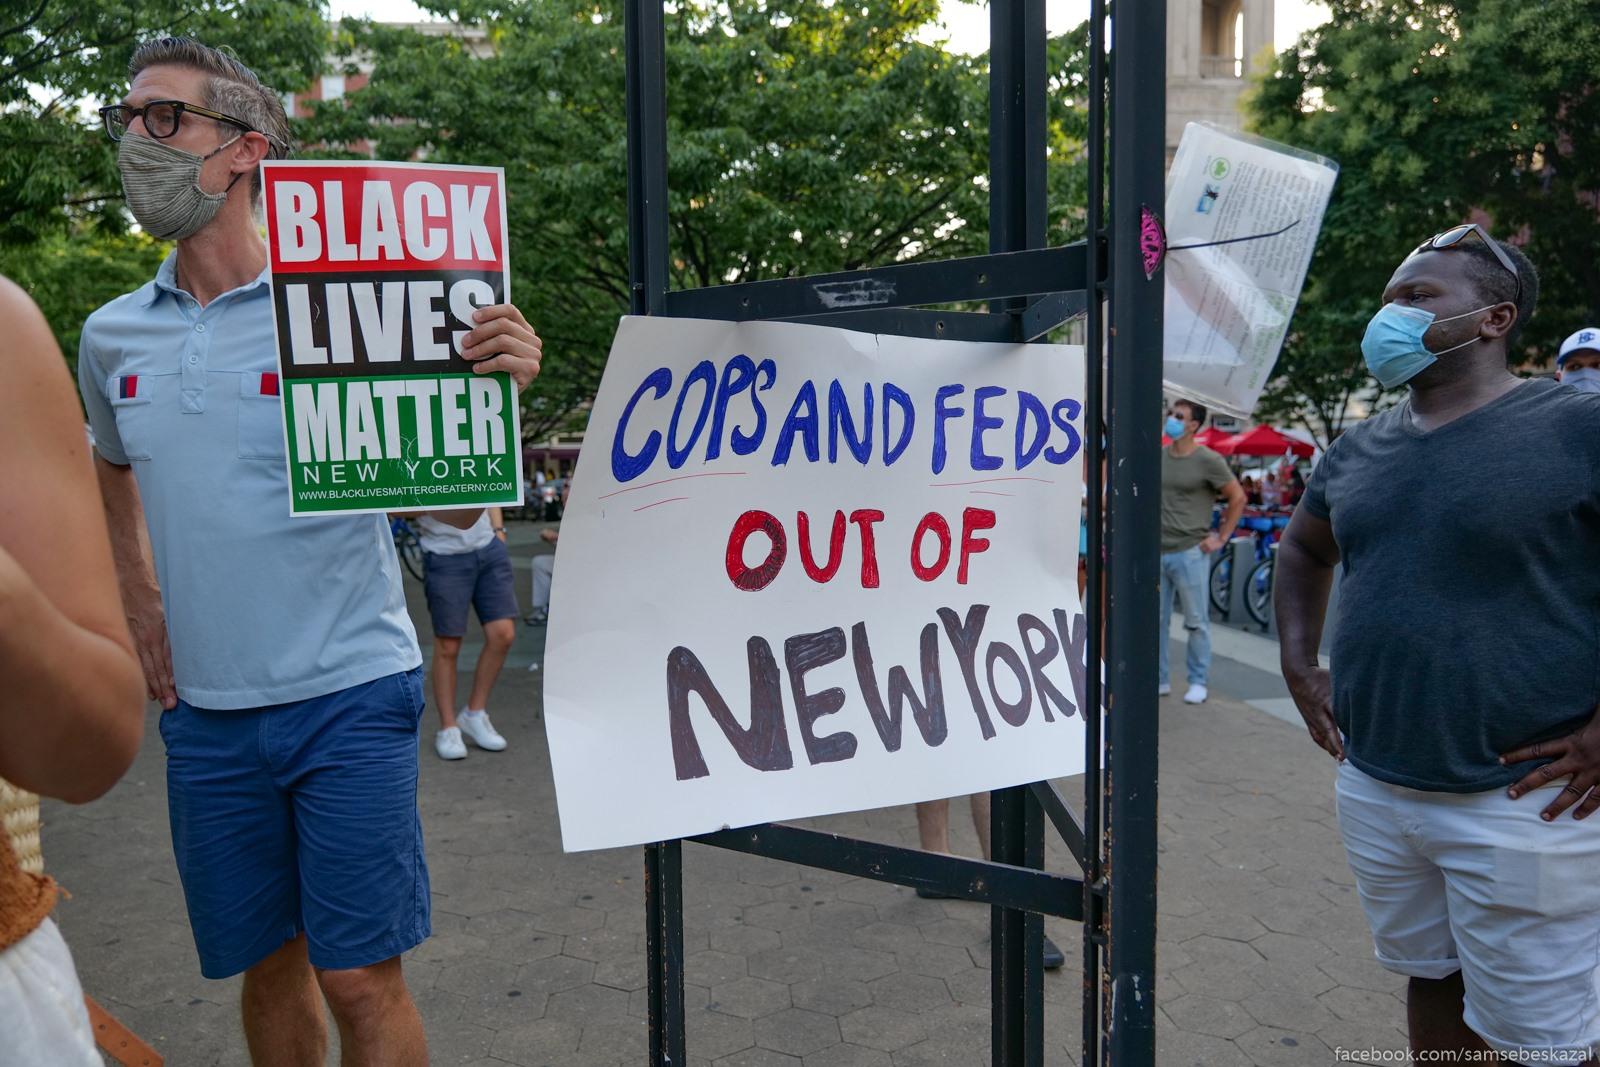 Два месяца с начала протестов в Нью-Йорке Kopy i federaly valite iz...